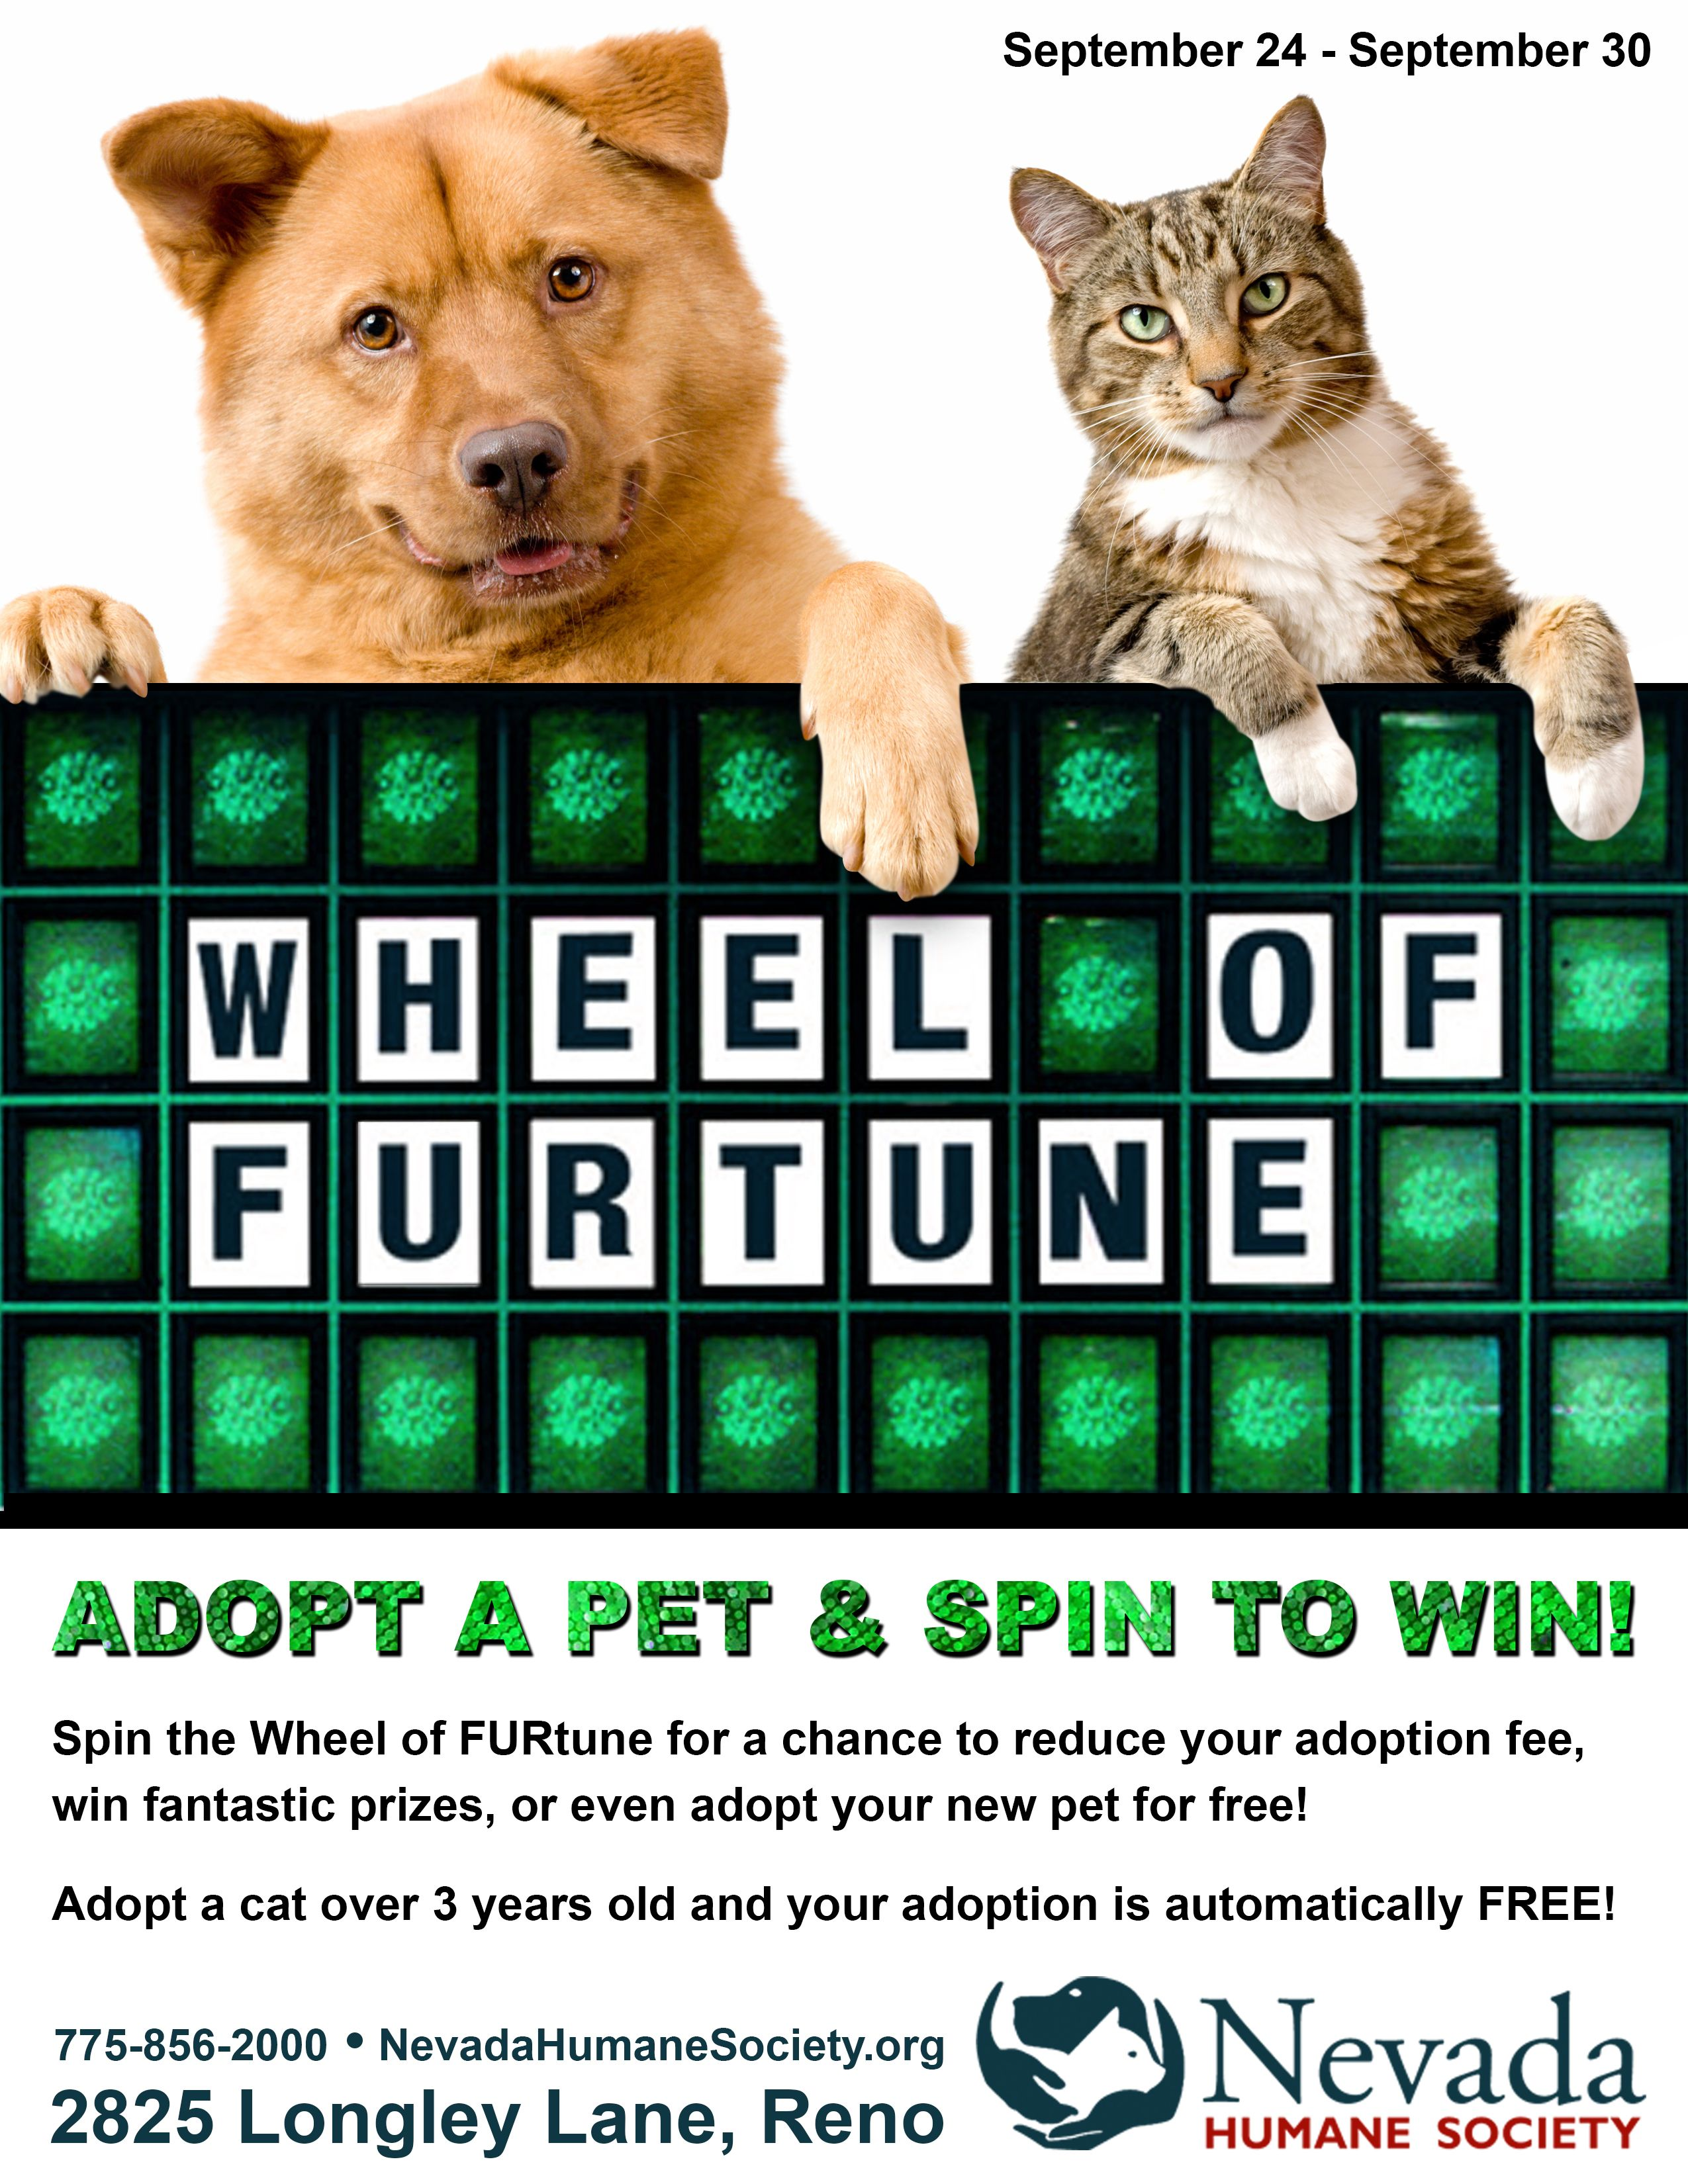 Wheel of FURtune! Cat adoption, Animal rescue, Humane